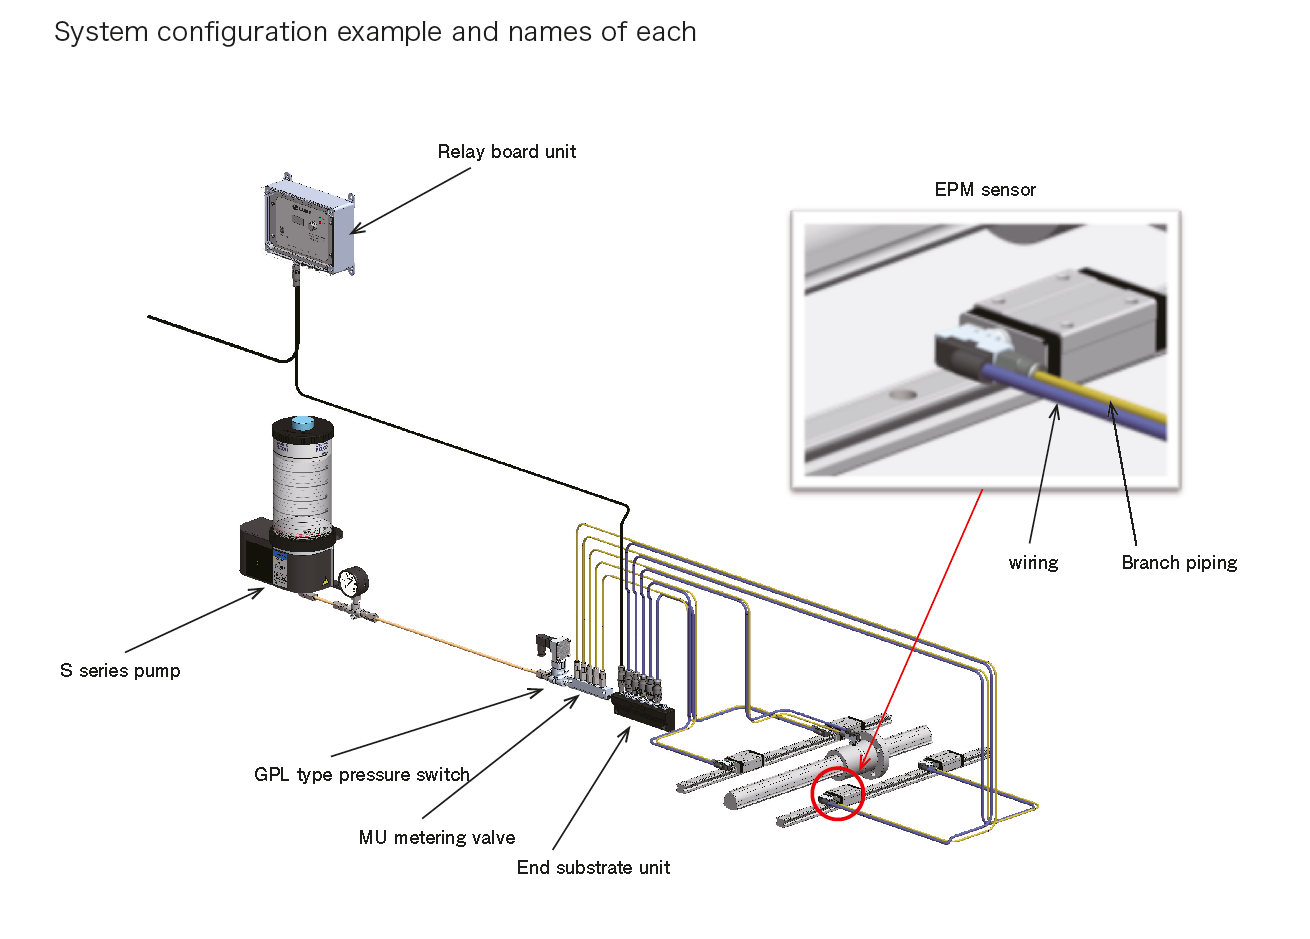 EPM (End Point Monitor) EPMシステムレイアウト